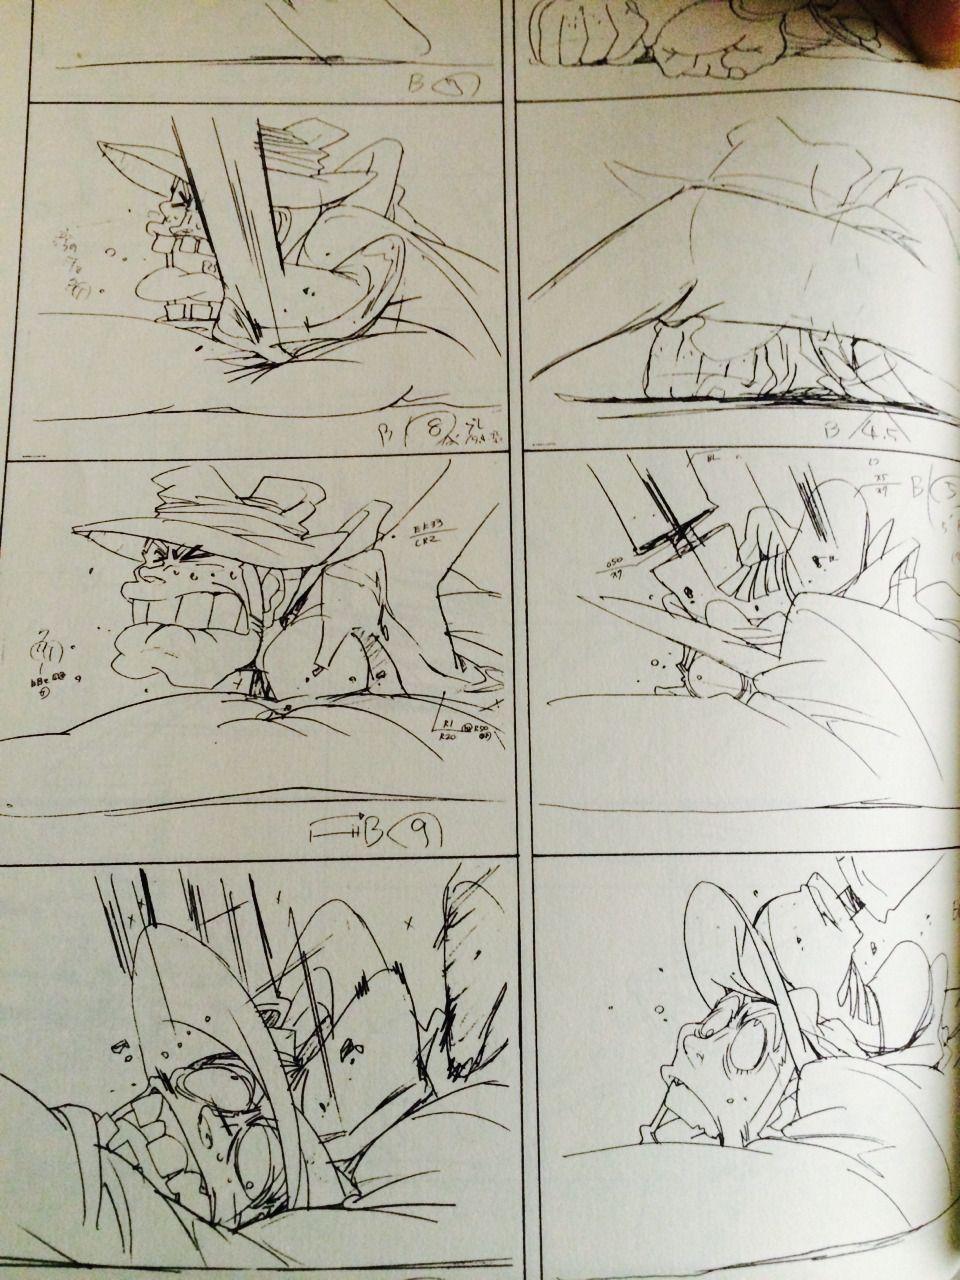 RNG Goddess — Just got one of Hiroyuki Imaishi sketchbooks. Has...